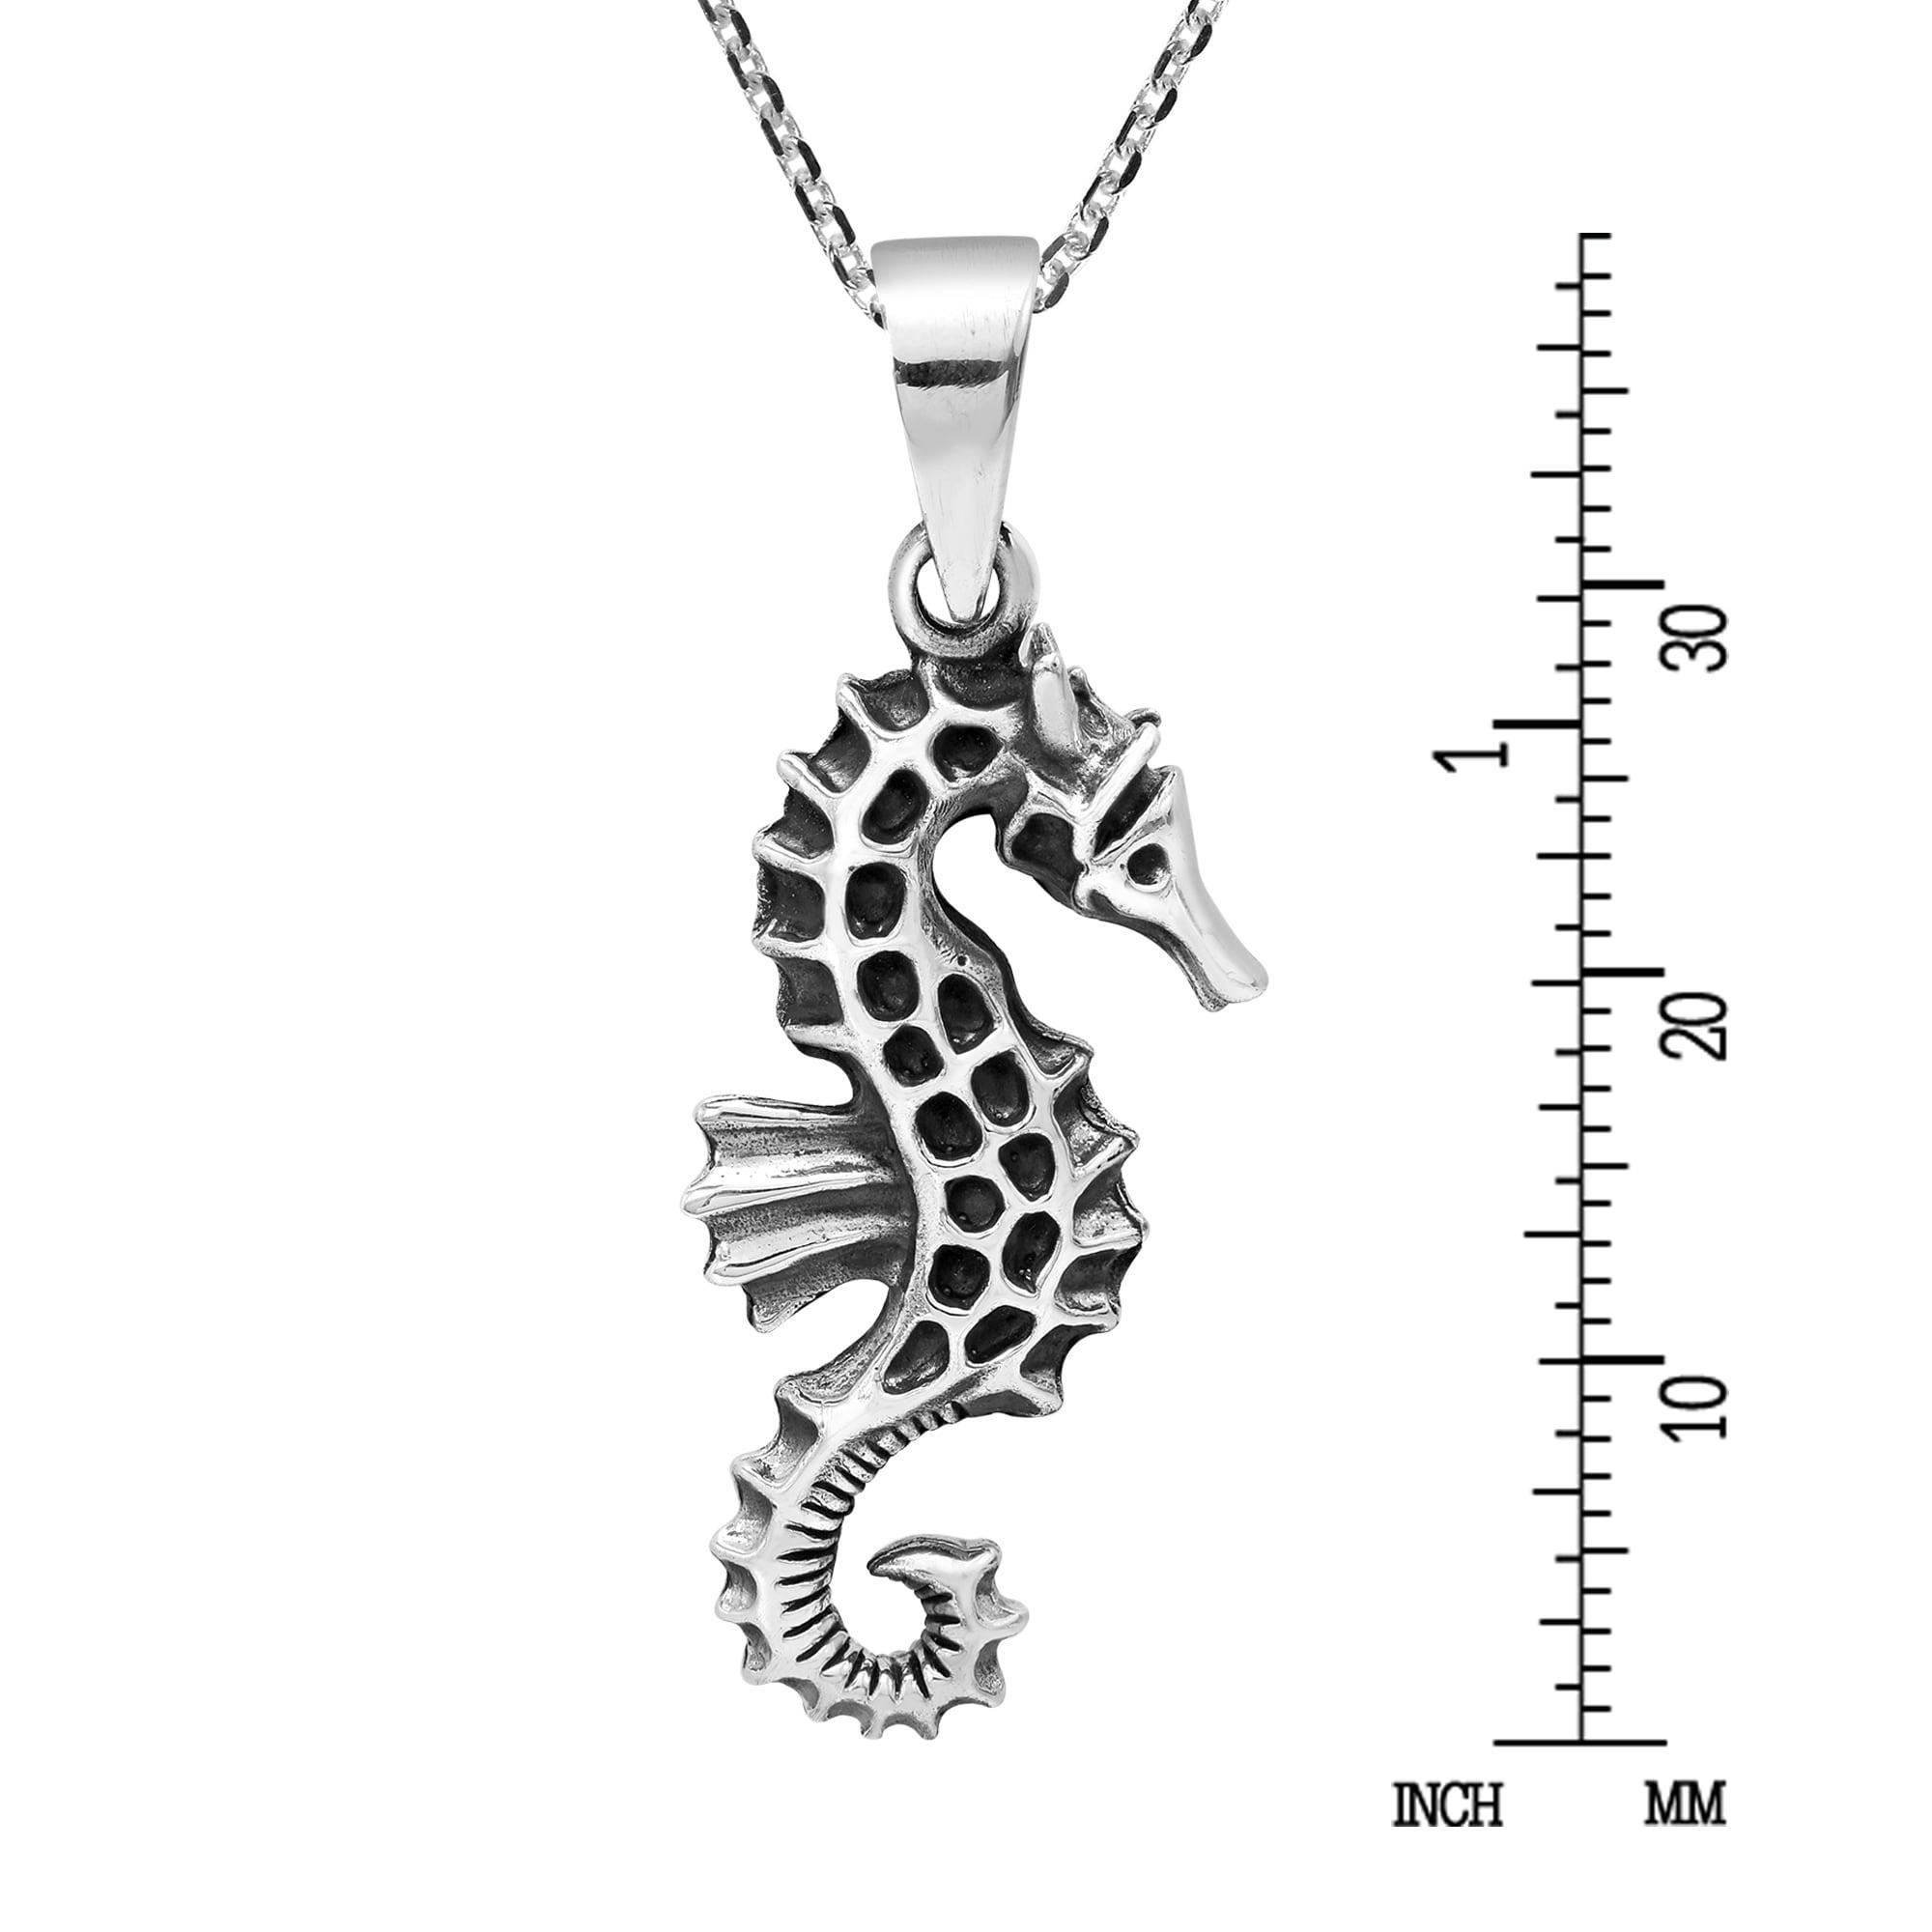 AeraVida Intricate Island Seahorse .925 Sterling Silver Pendant Necklace